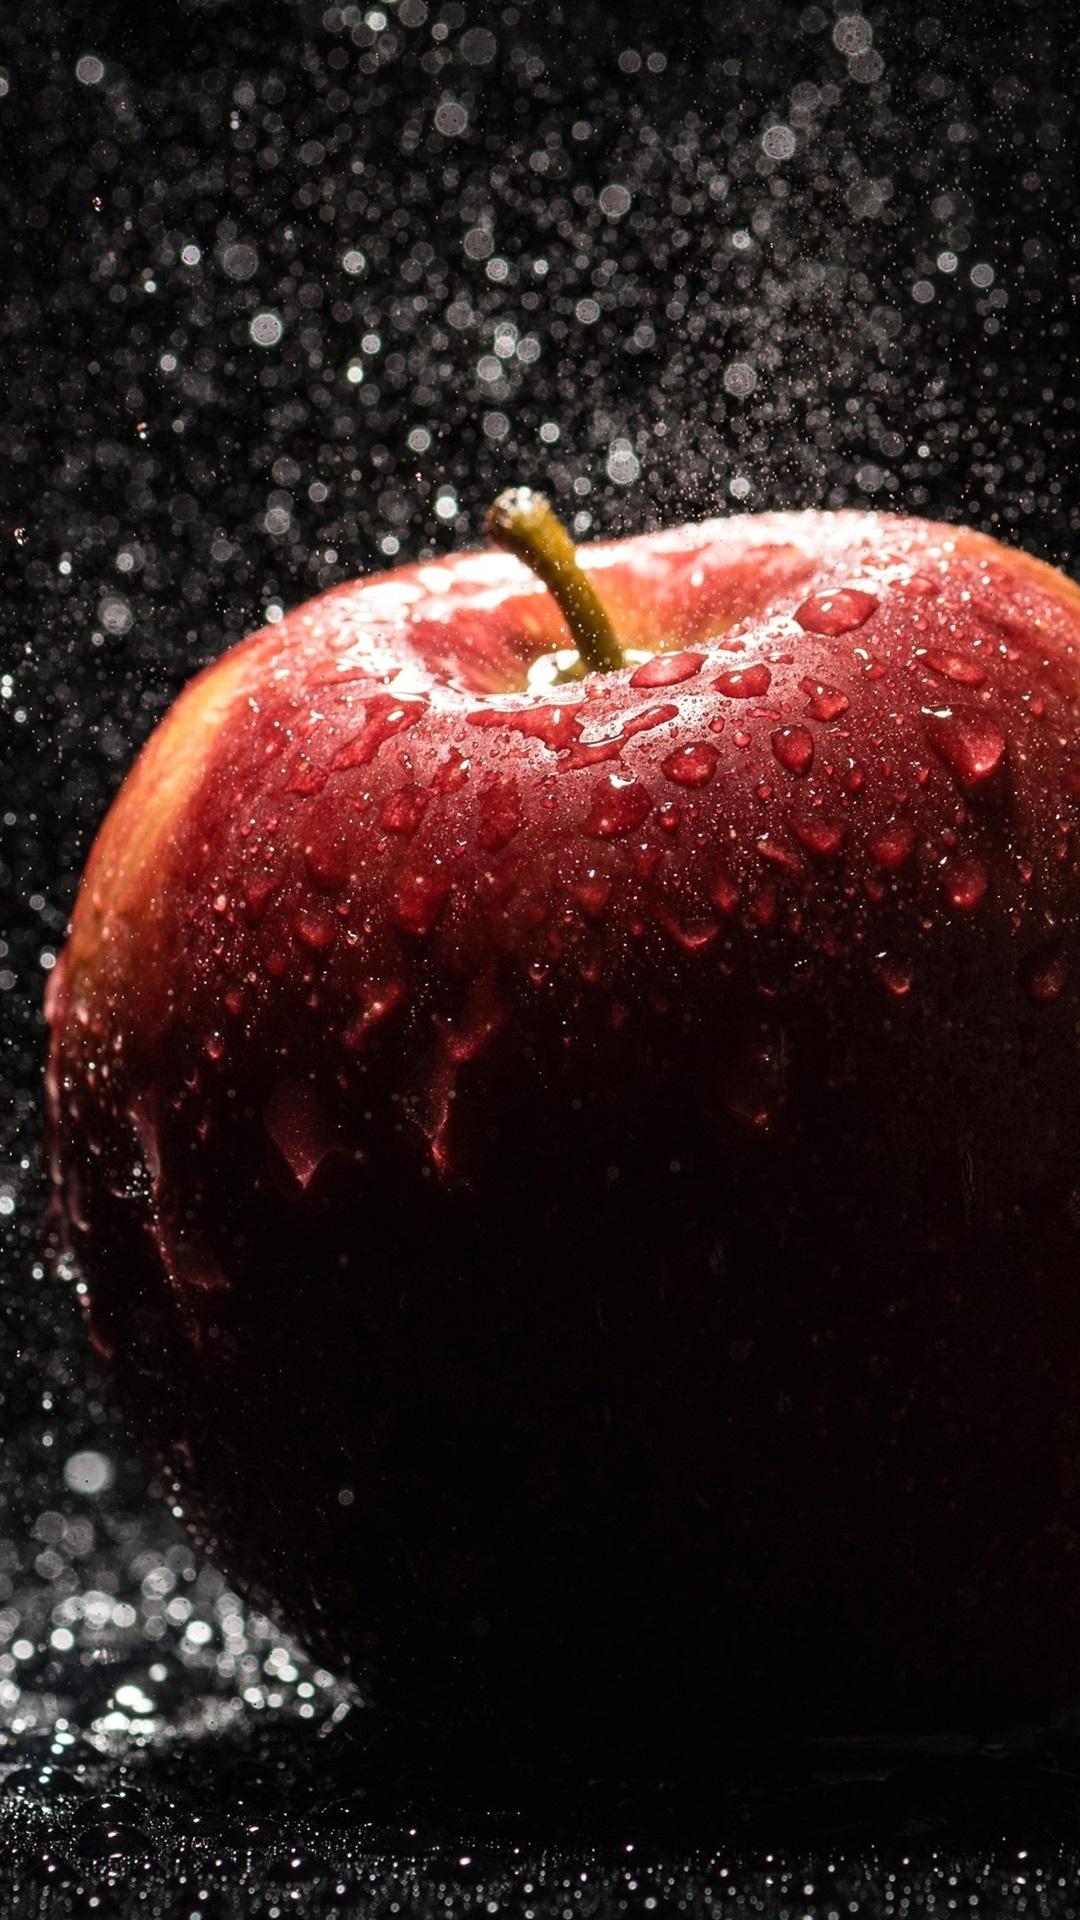 Wallpaper Red Apple Rain Water Drops 3840x2160 Uhd 4k